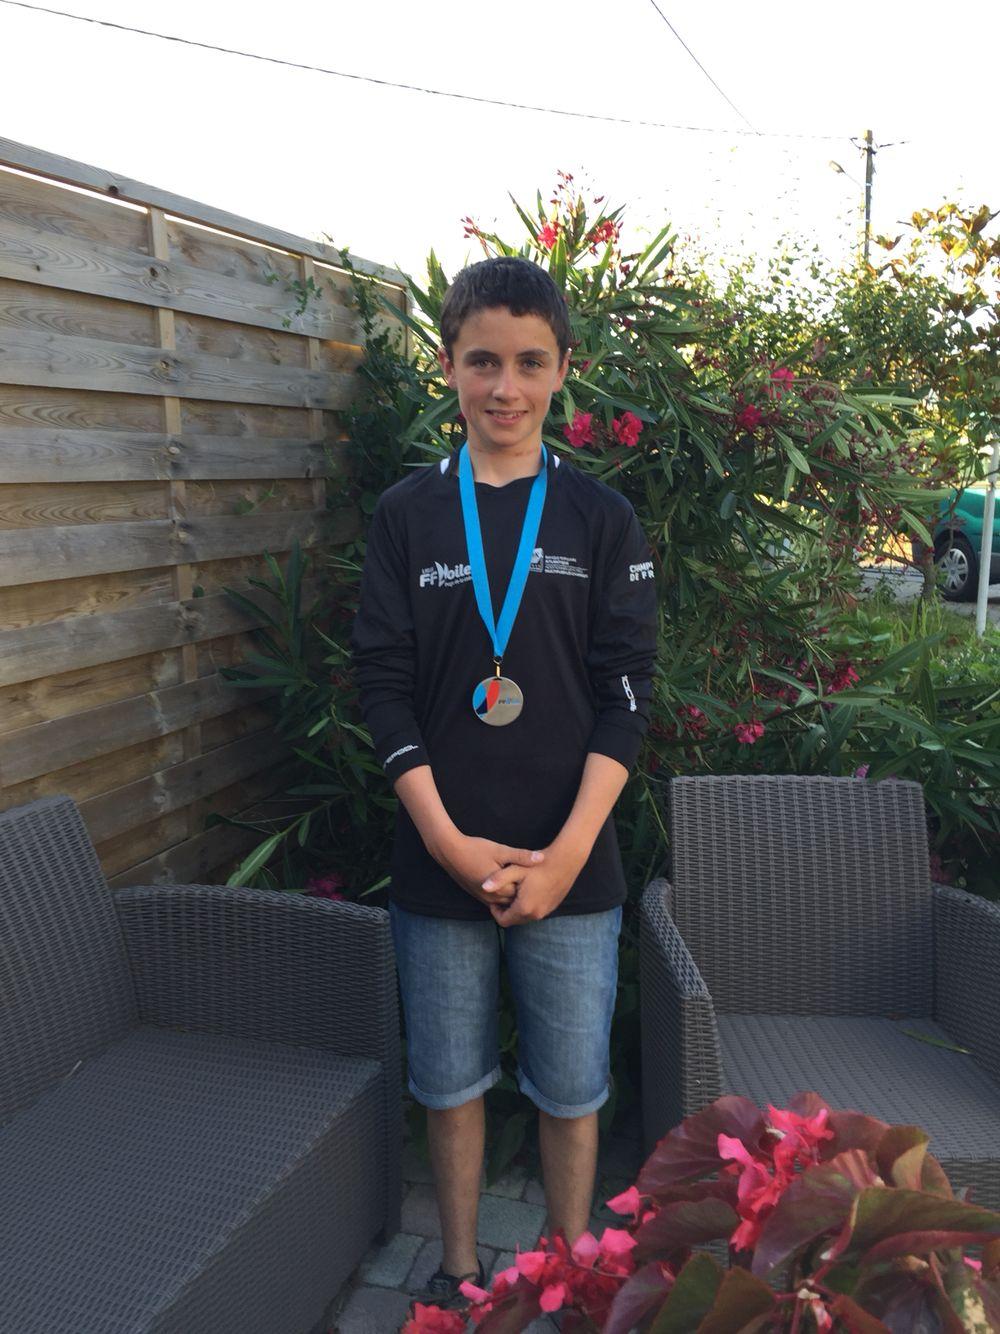 Lohann vice champion de France 2015